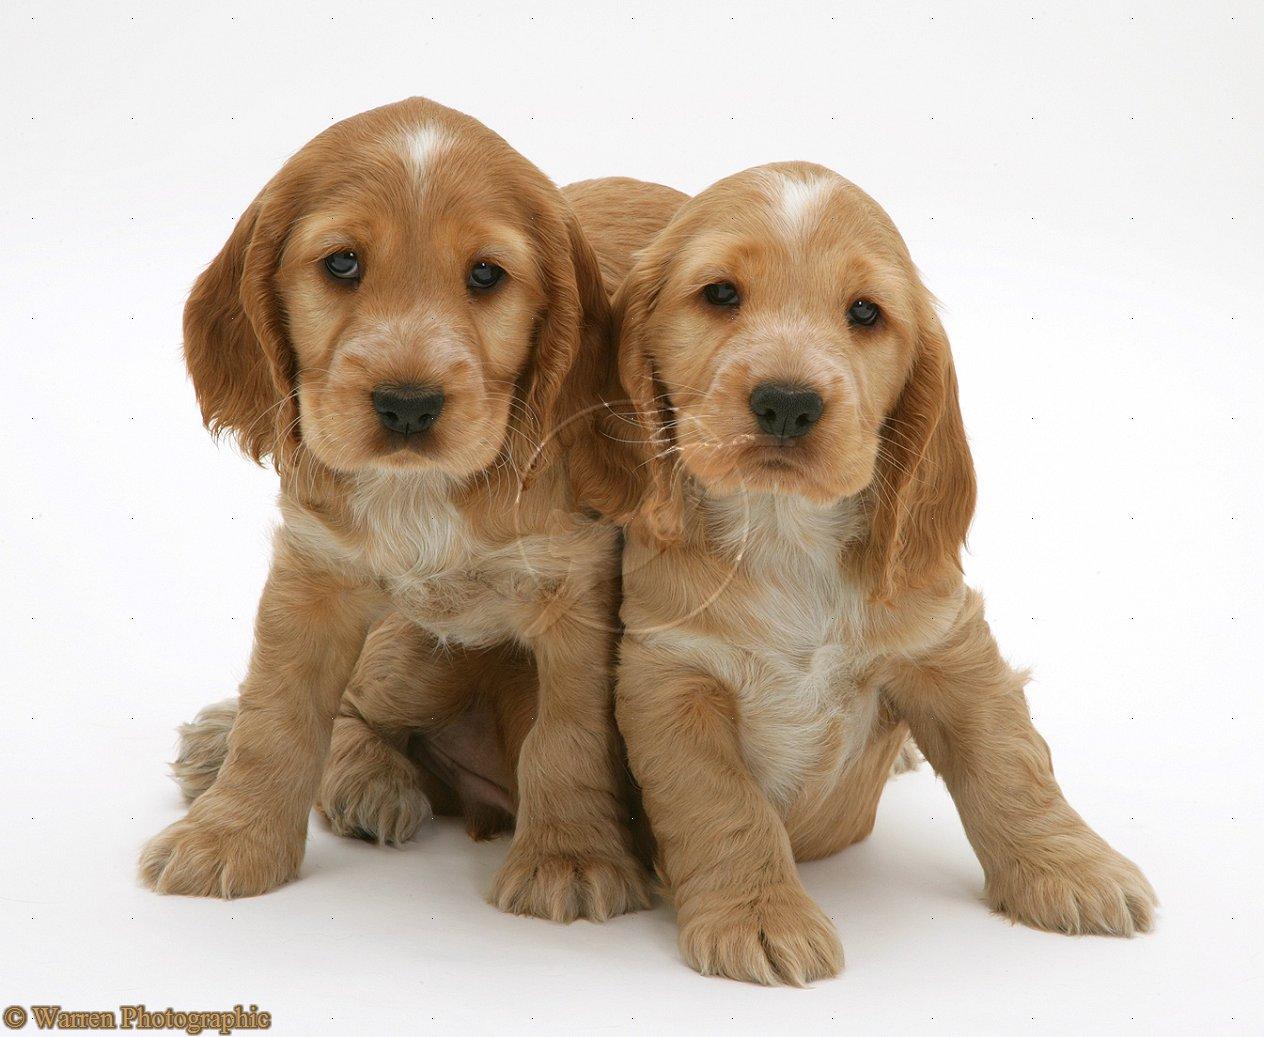 English Cocker Spaniel Puppies: English Cocker Spaniel Puppies Breed